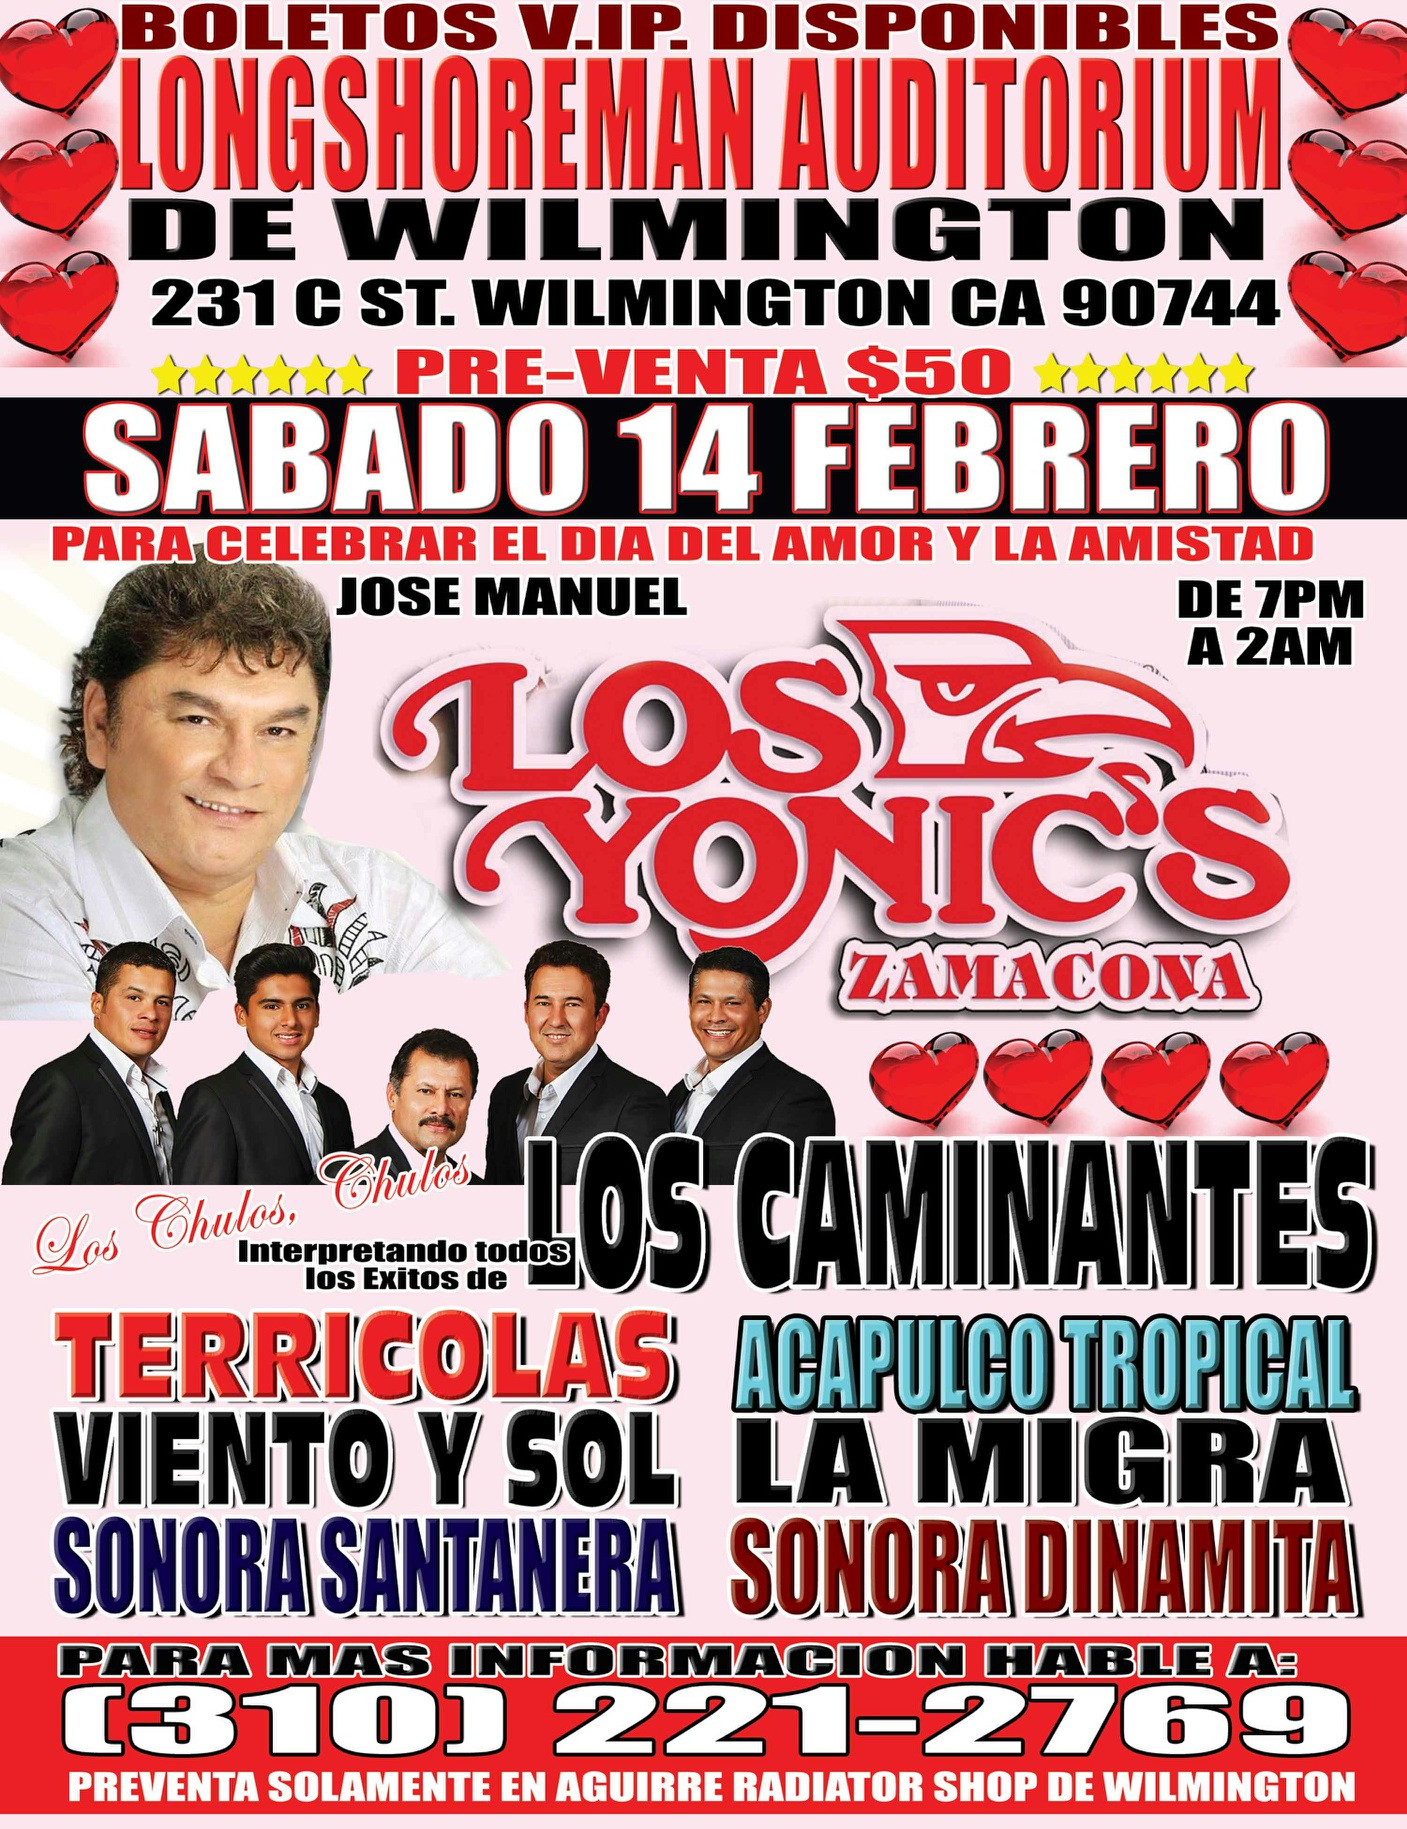 Los Yonics @ Longshoreman Auditorium | Los Angeles | California | United States